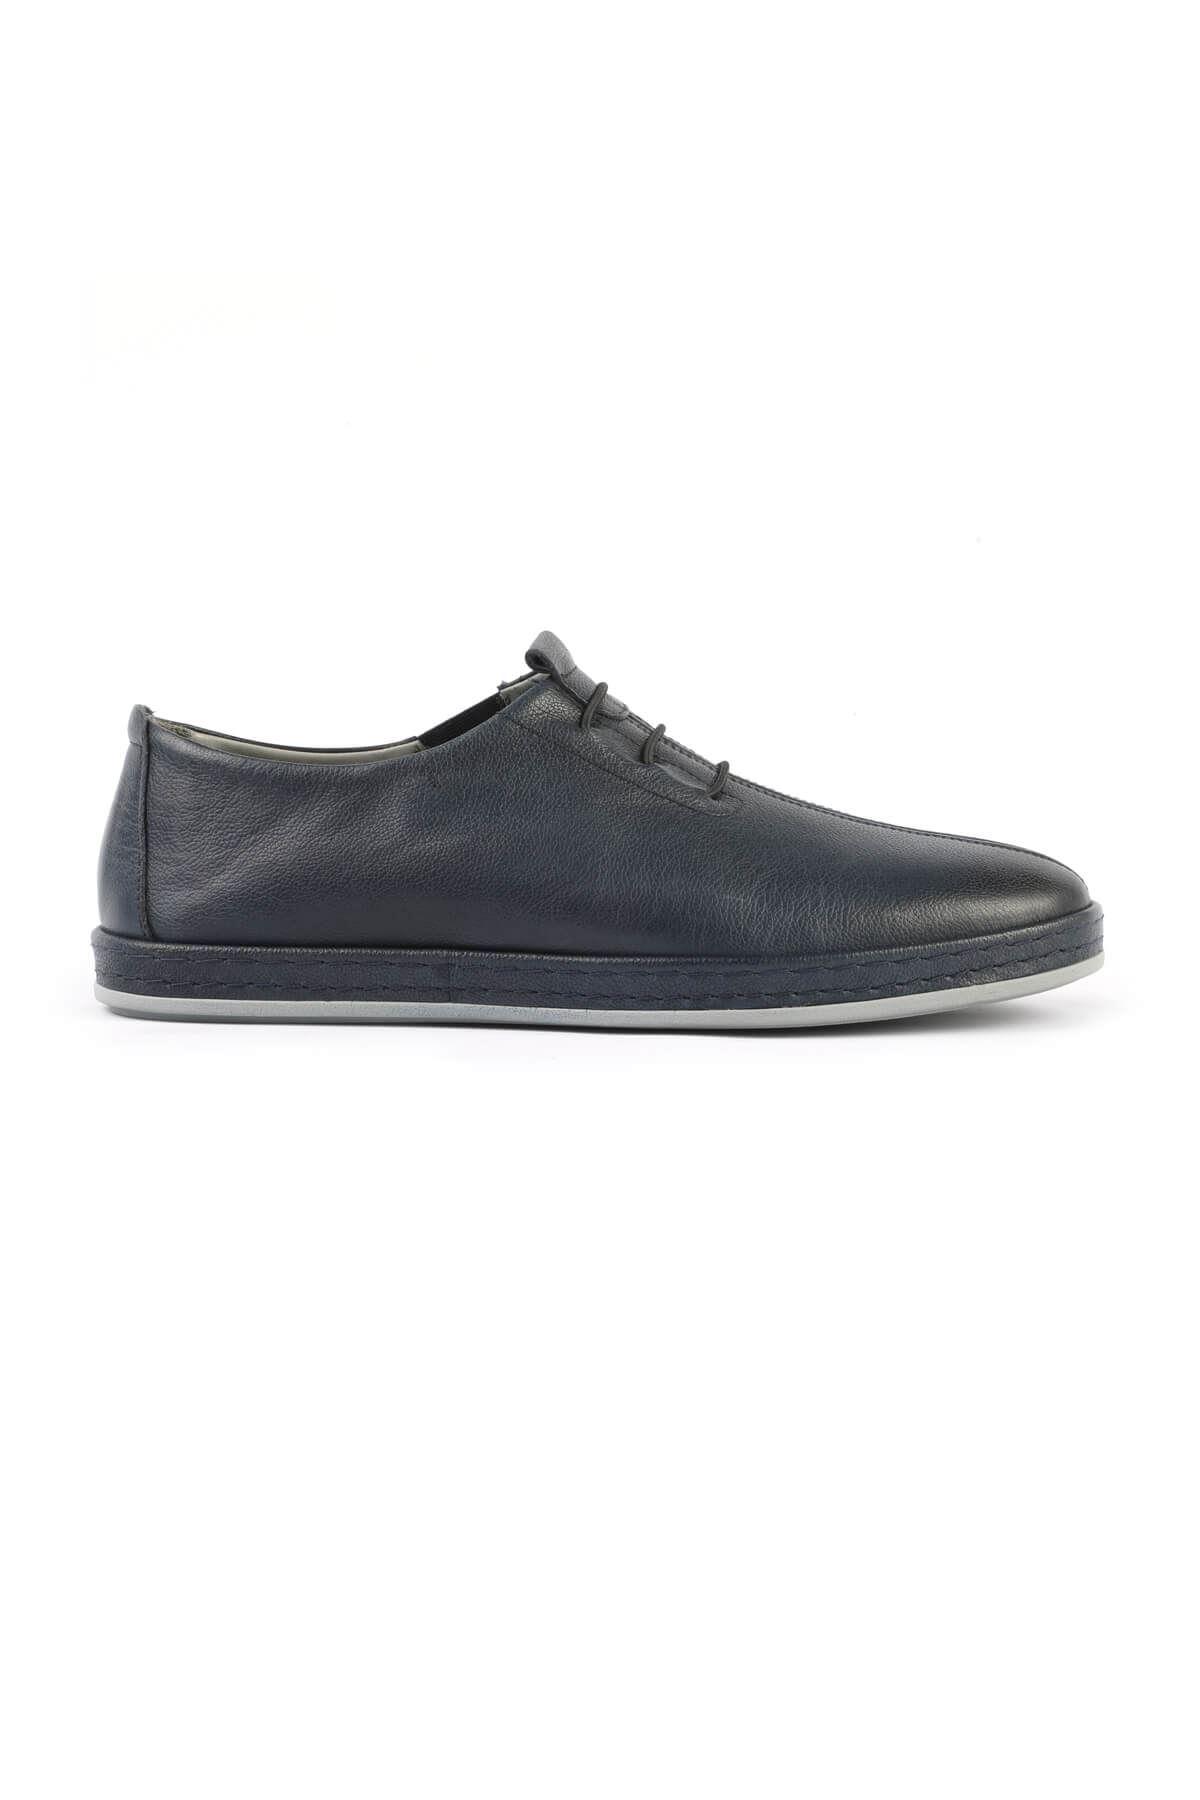 Libero 3042 Navy Blue Casual Shoes